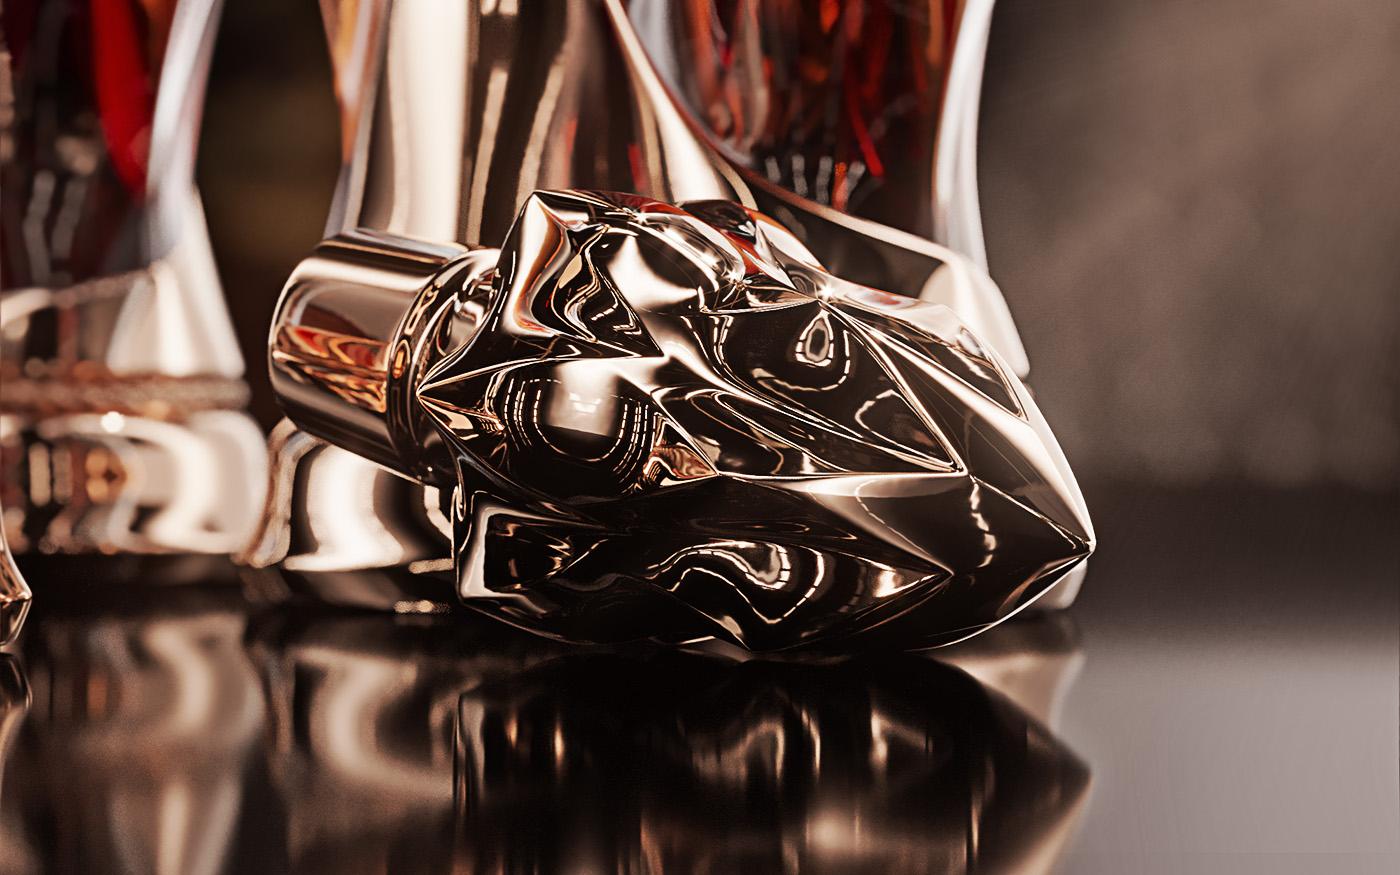 Thorne luxury armagnac bottle 9.jpg